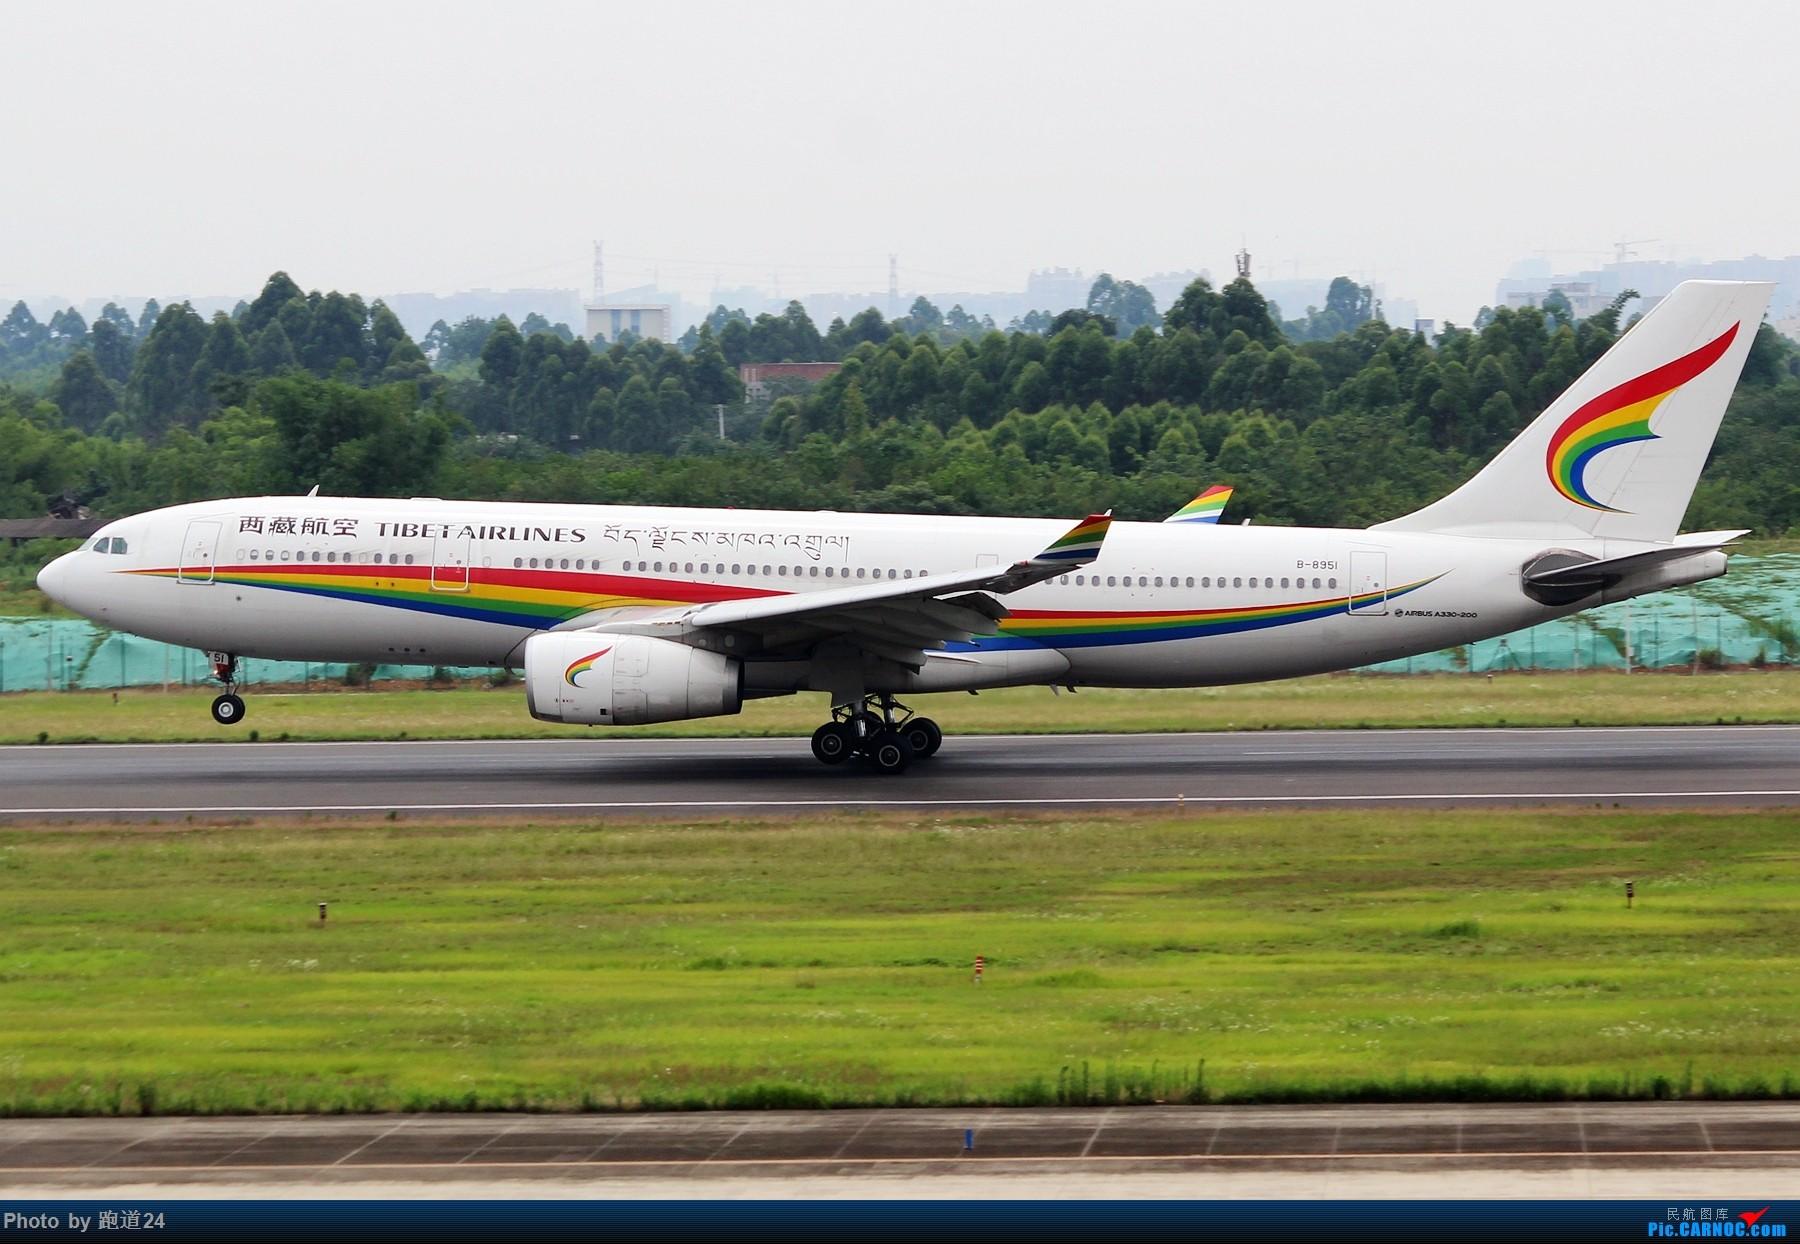 Re:[原创]【多图党】6月18日成都拍机【埃塞俄比亚航空B777-200LR】 AIRBUS A330-200 B-8951 中国成都双流国际机场